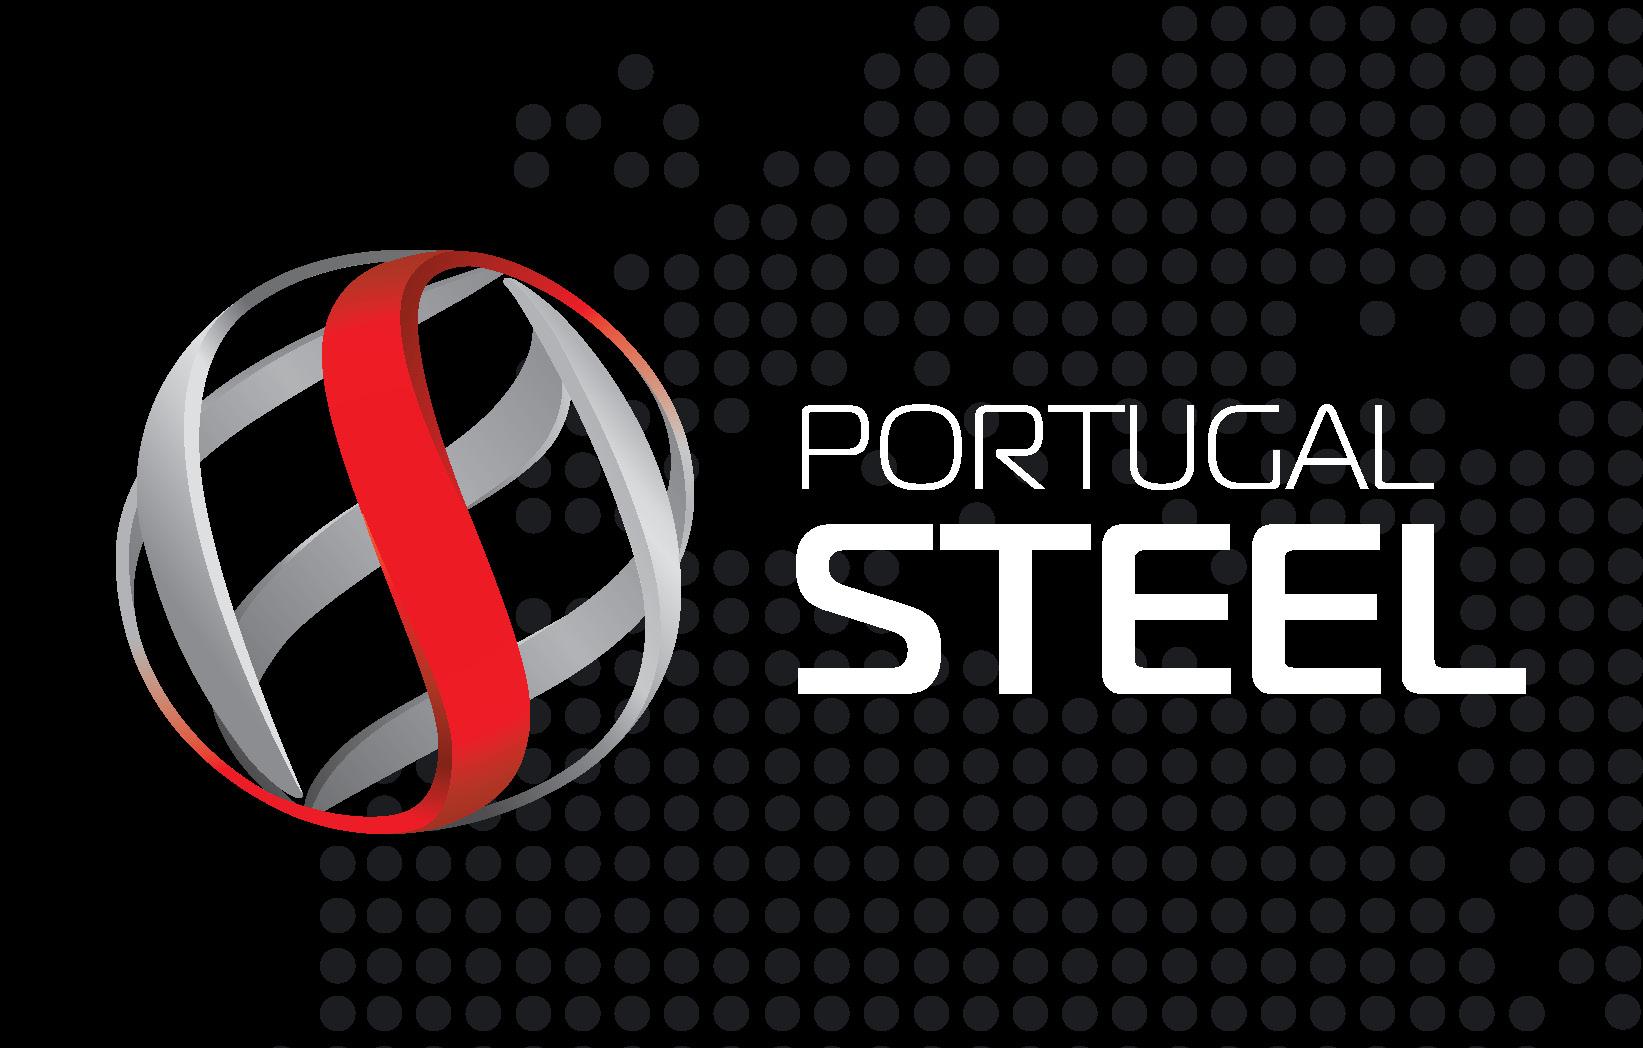 Portugal Steel